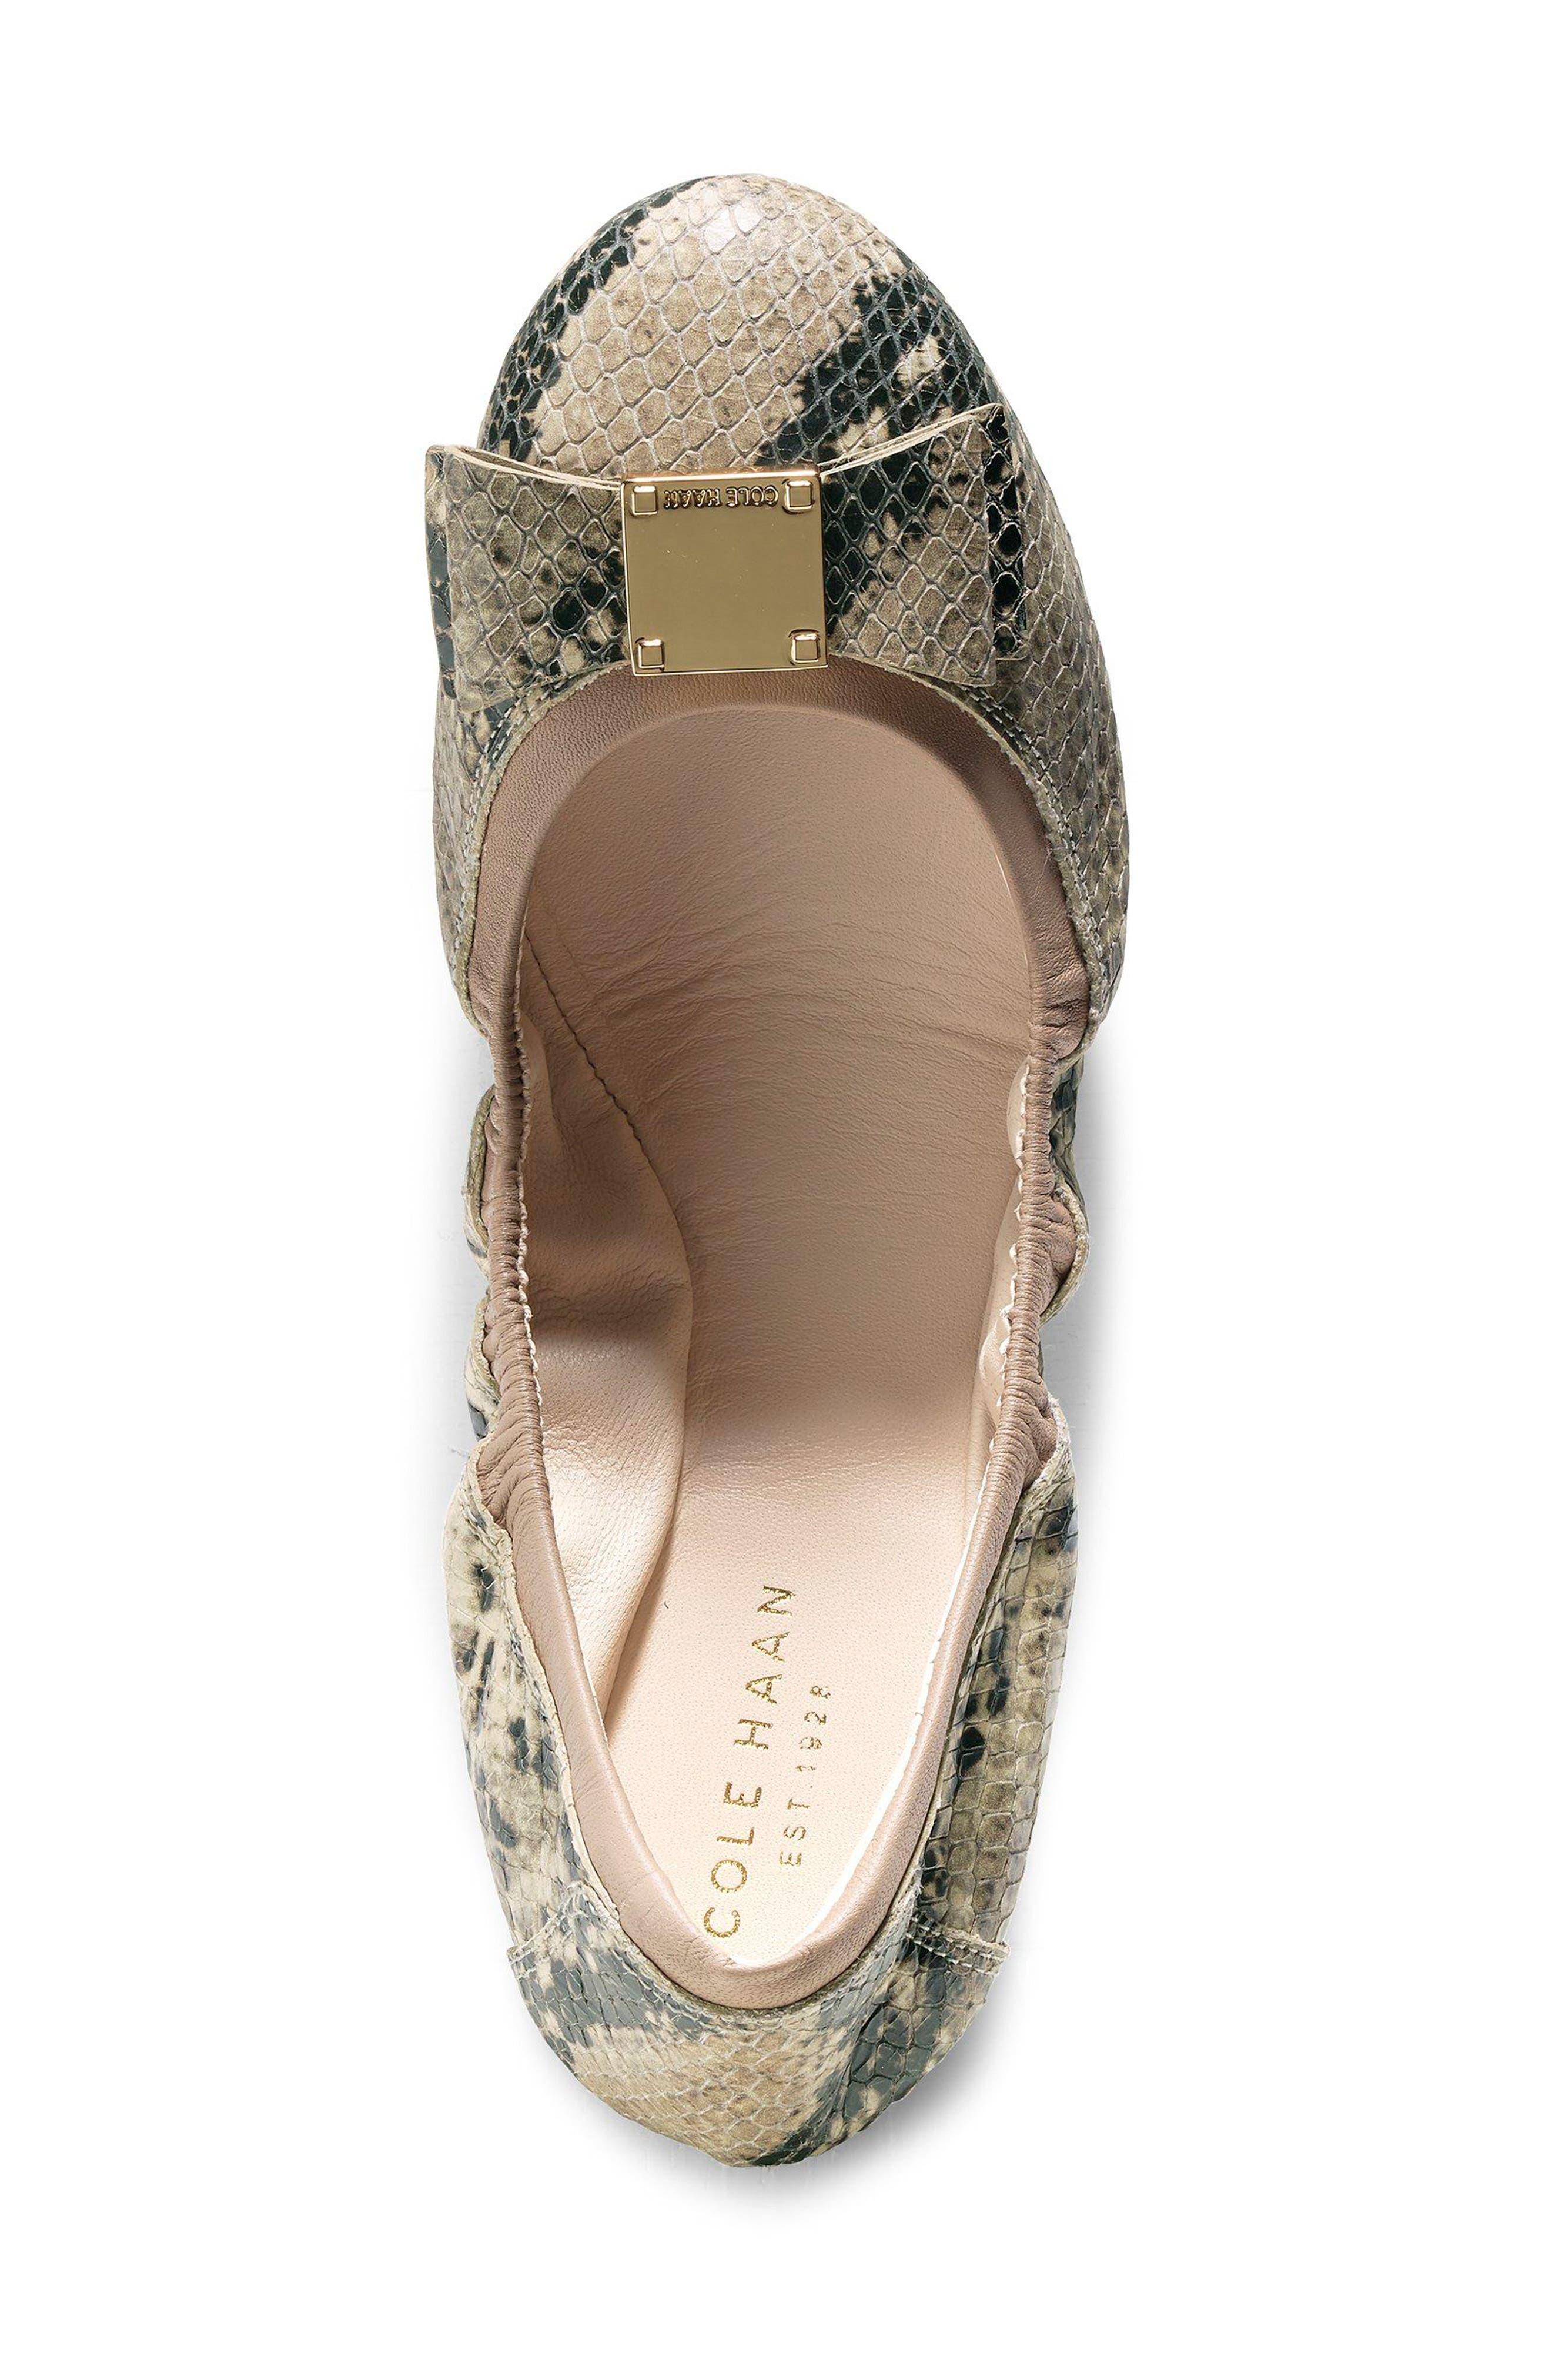 'Tali' Bow Ballet Flat,                             Alternate thumbnail 8, color,                             Roccia Snake Print Leather